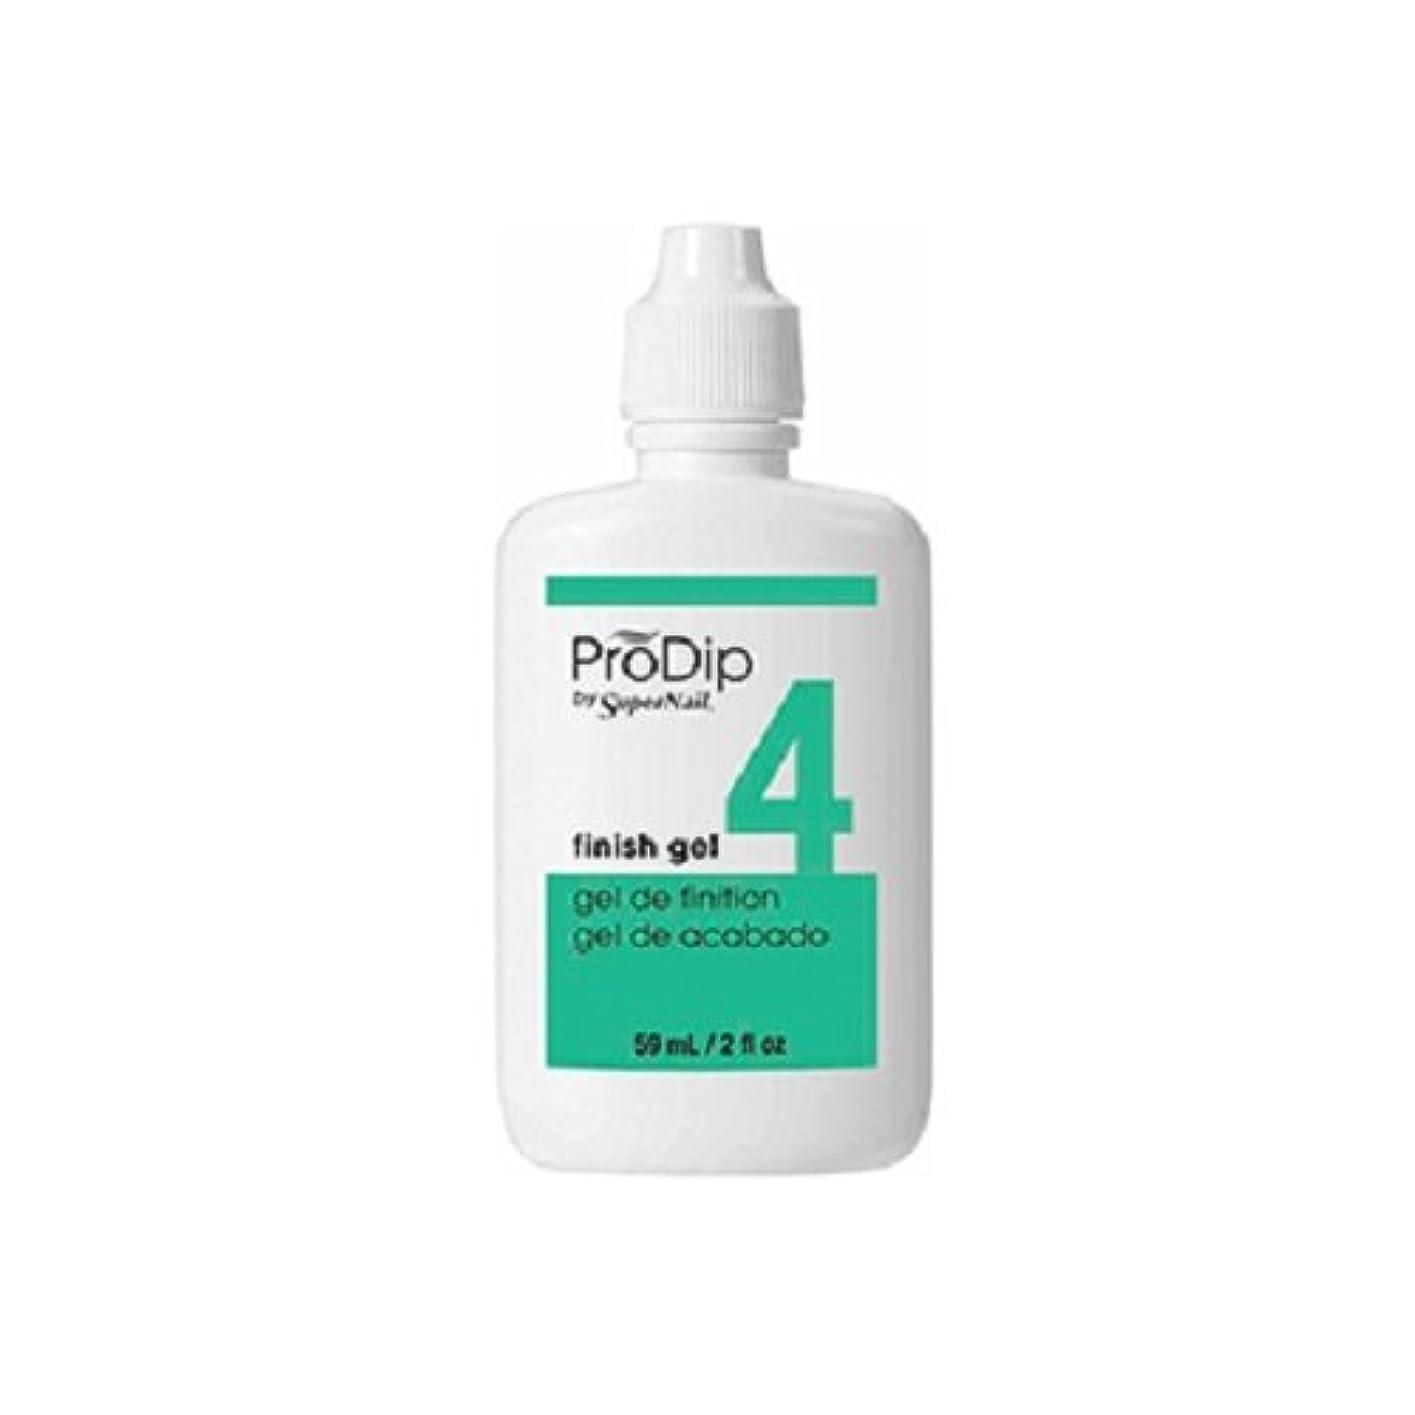 SuperNail ProDip - Finish Gel - 59 ml/2 oz